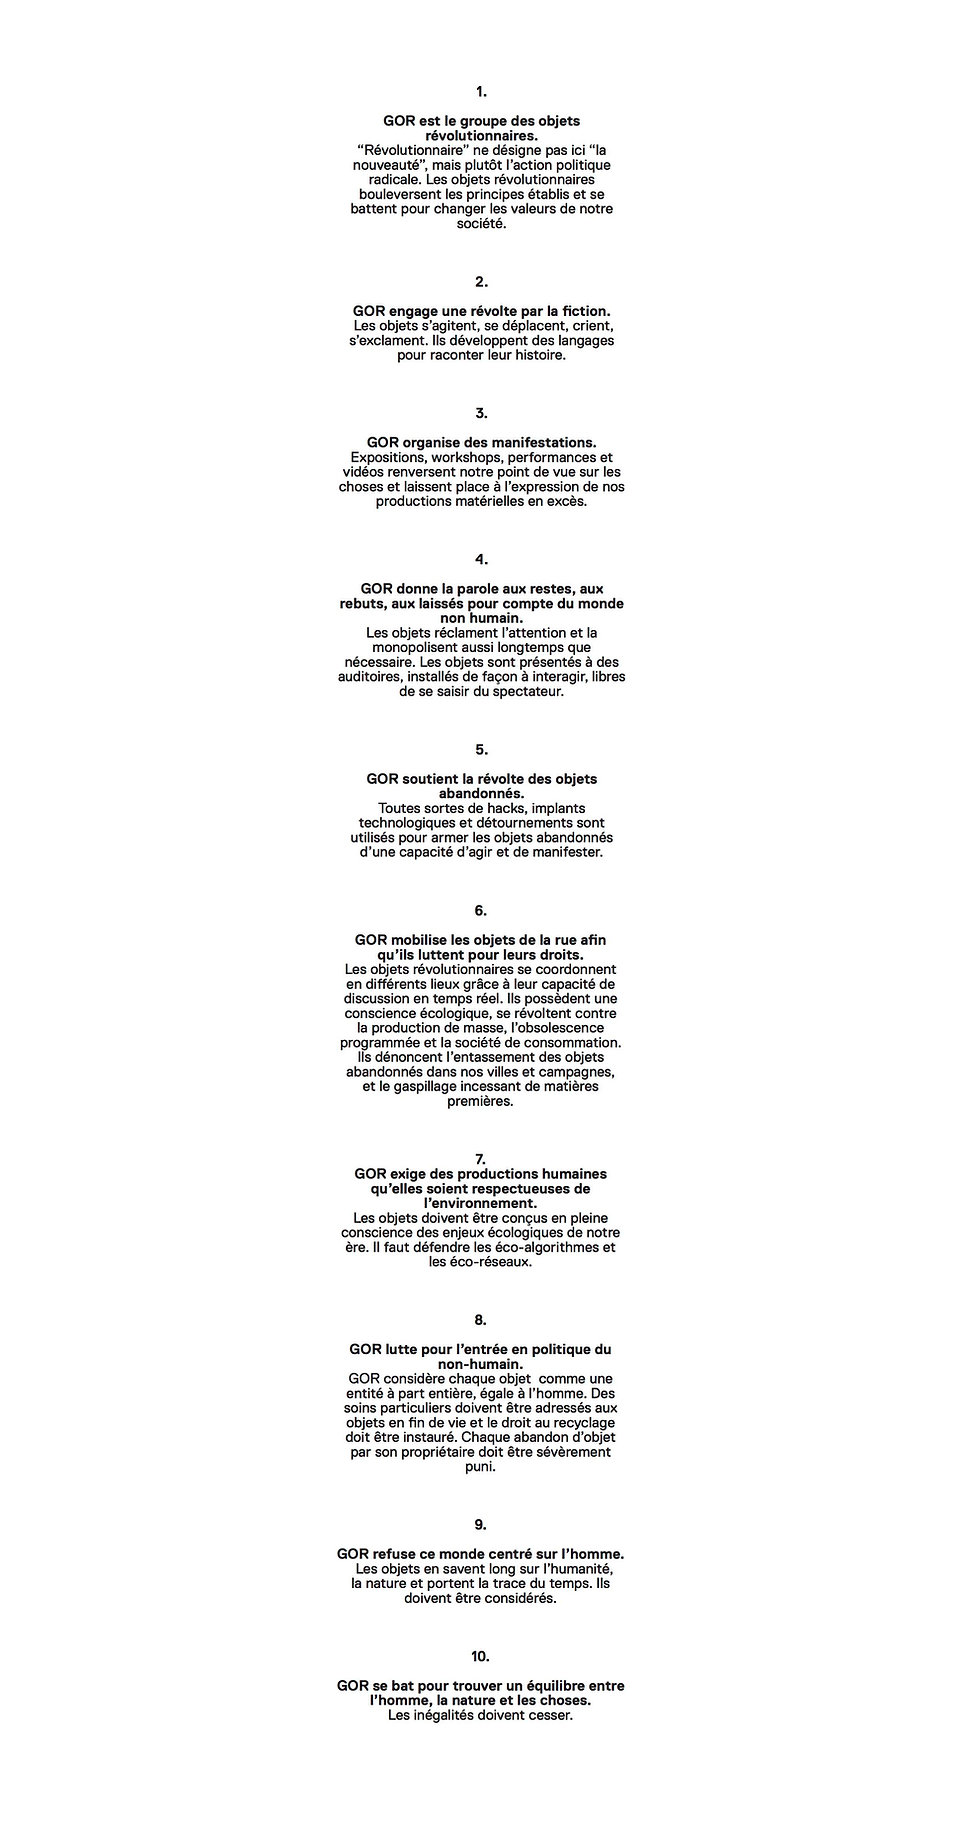 GOR—manifesto.jpg